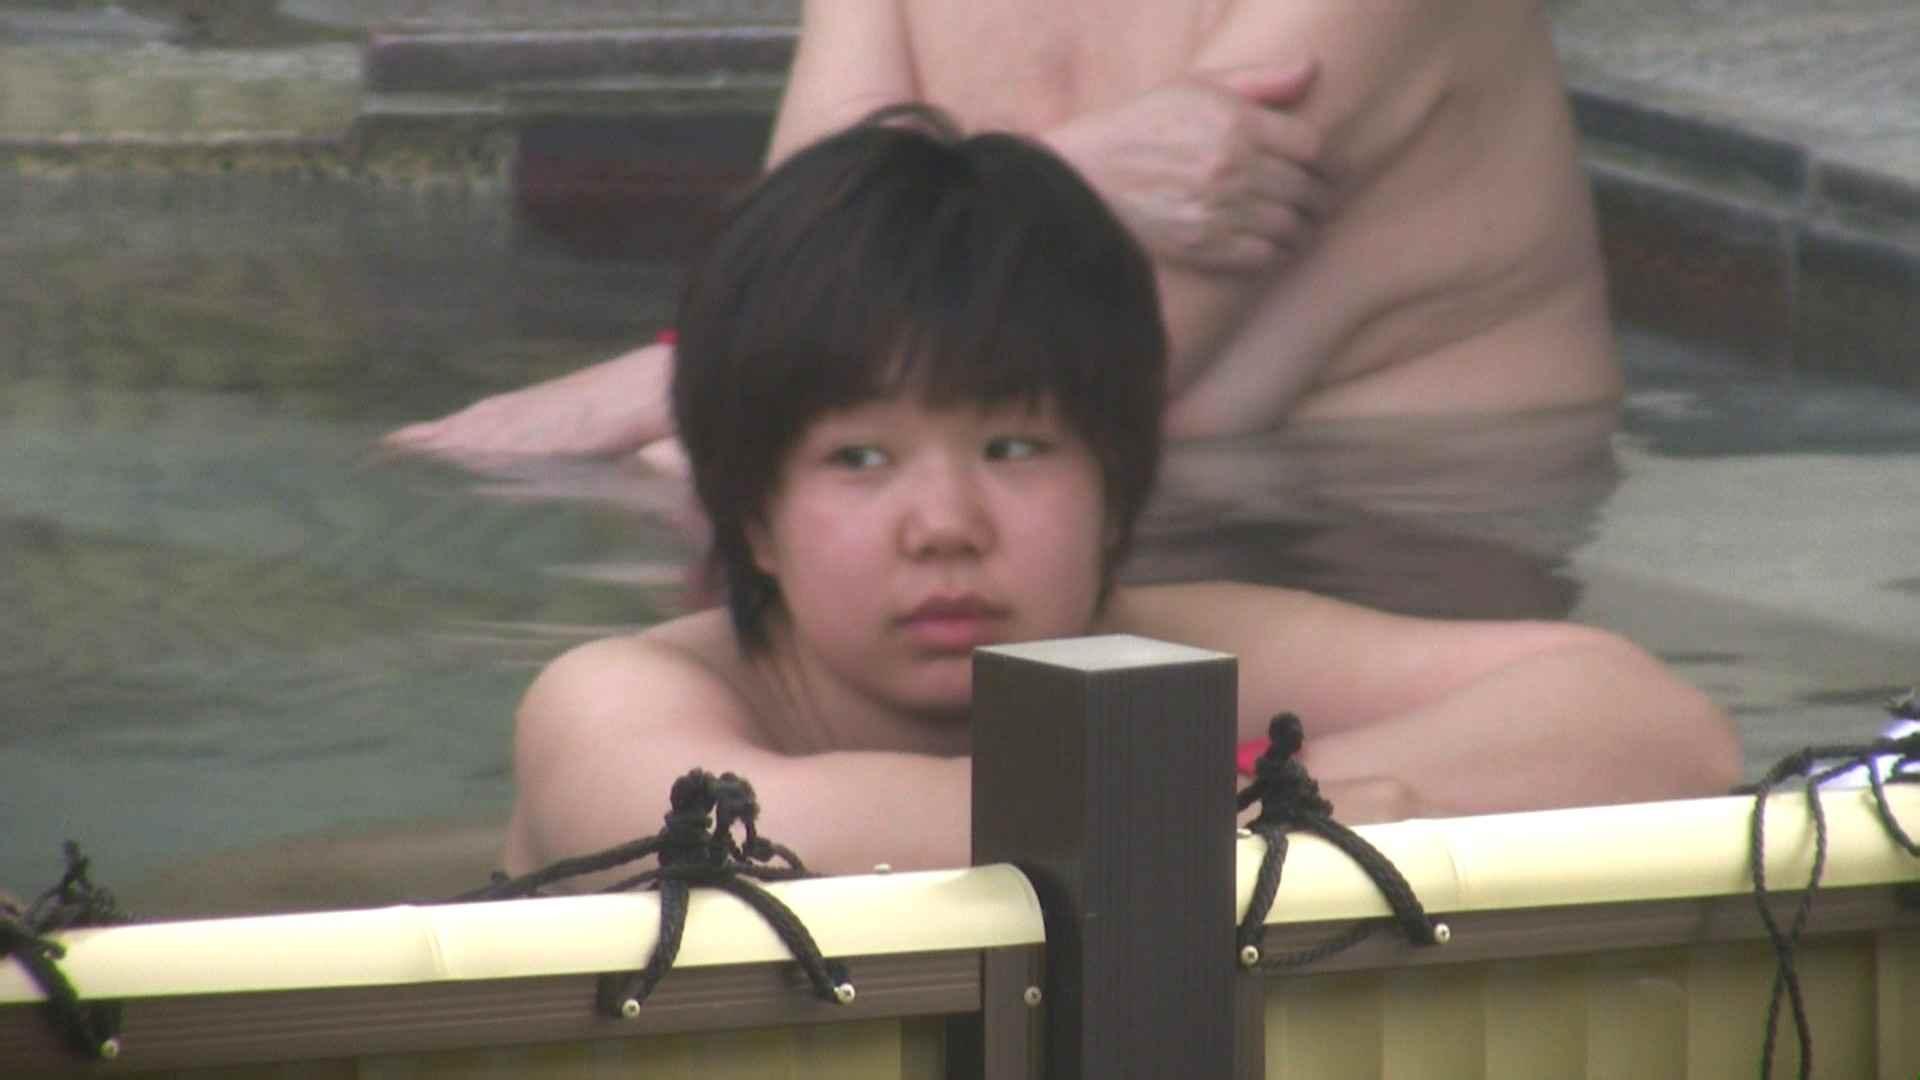 Aquaな露天風呂Vol.53【VIP限定】 OLエロ画像 盗撮おめこ無修正動画無料 54PICs 38